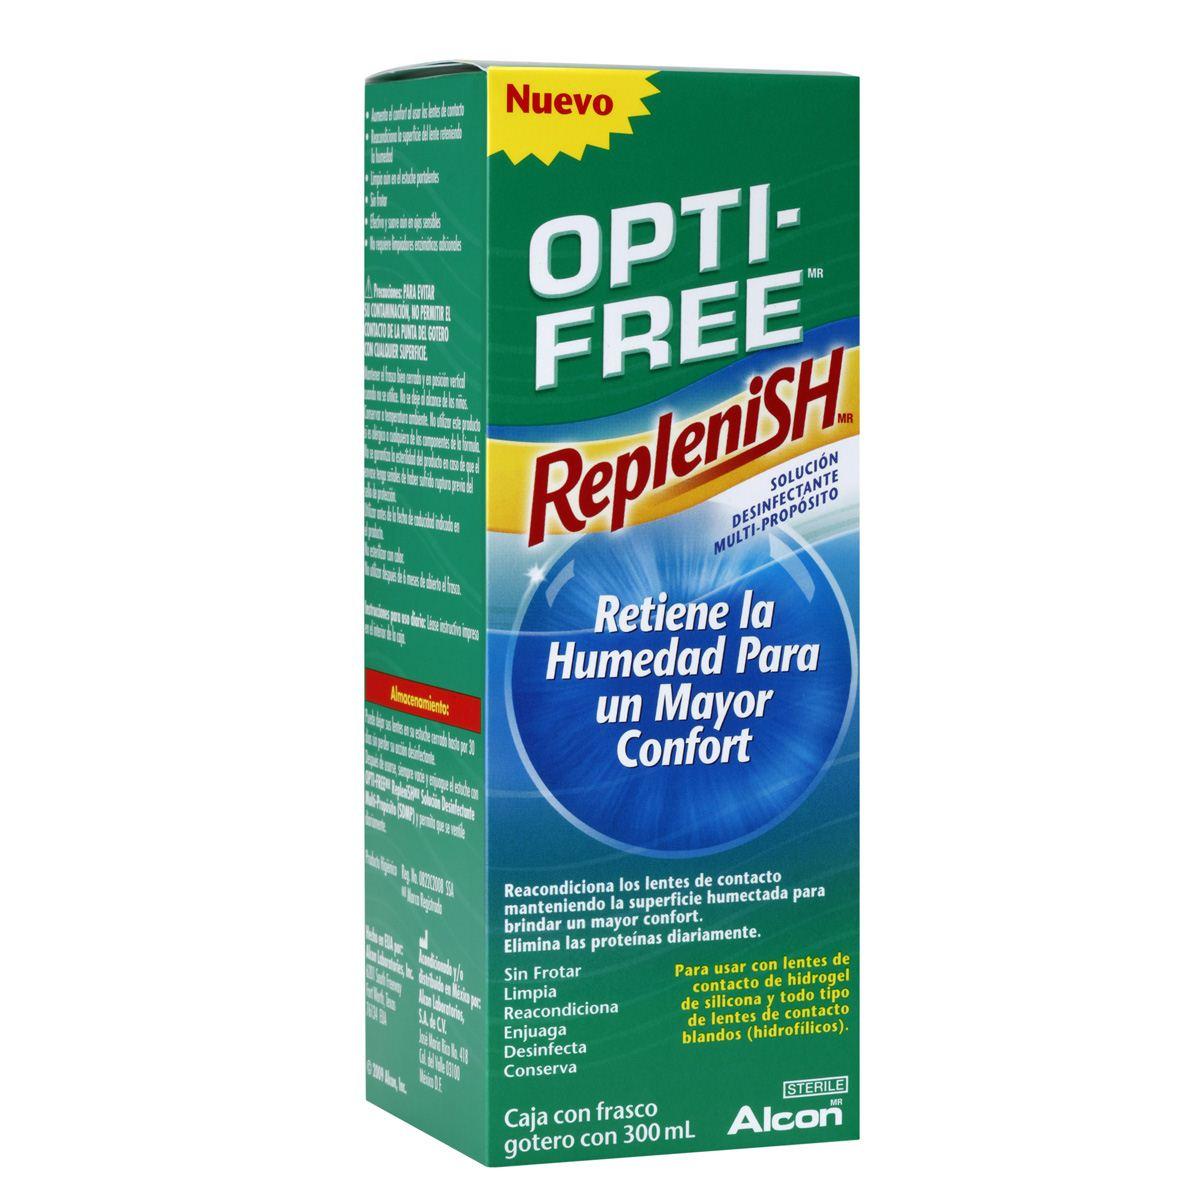 Solución opti free  replenish 300 ml  - Sanborns